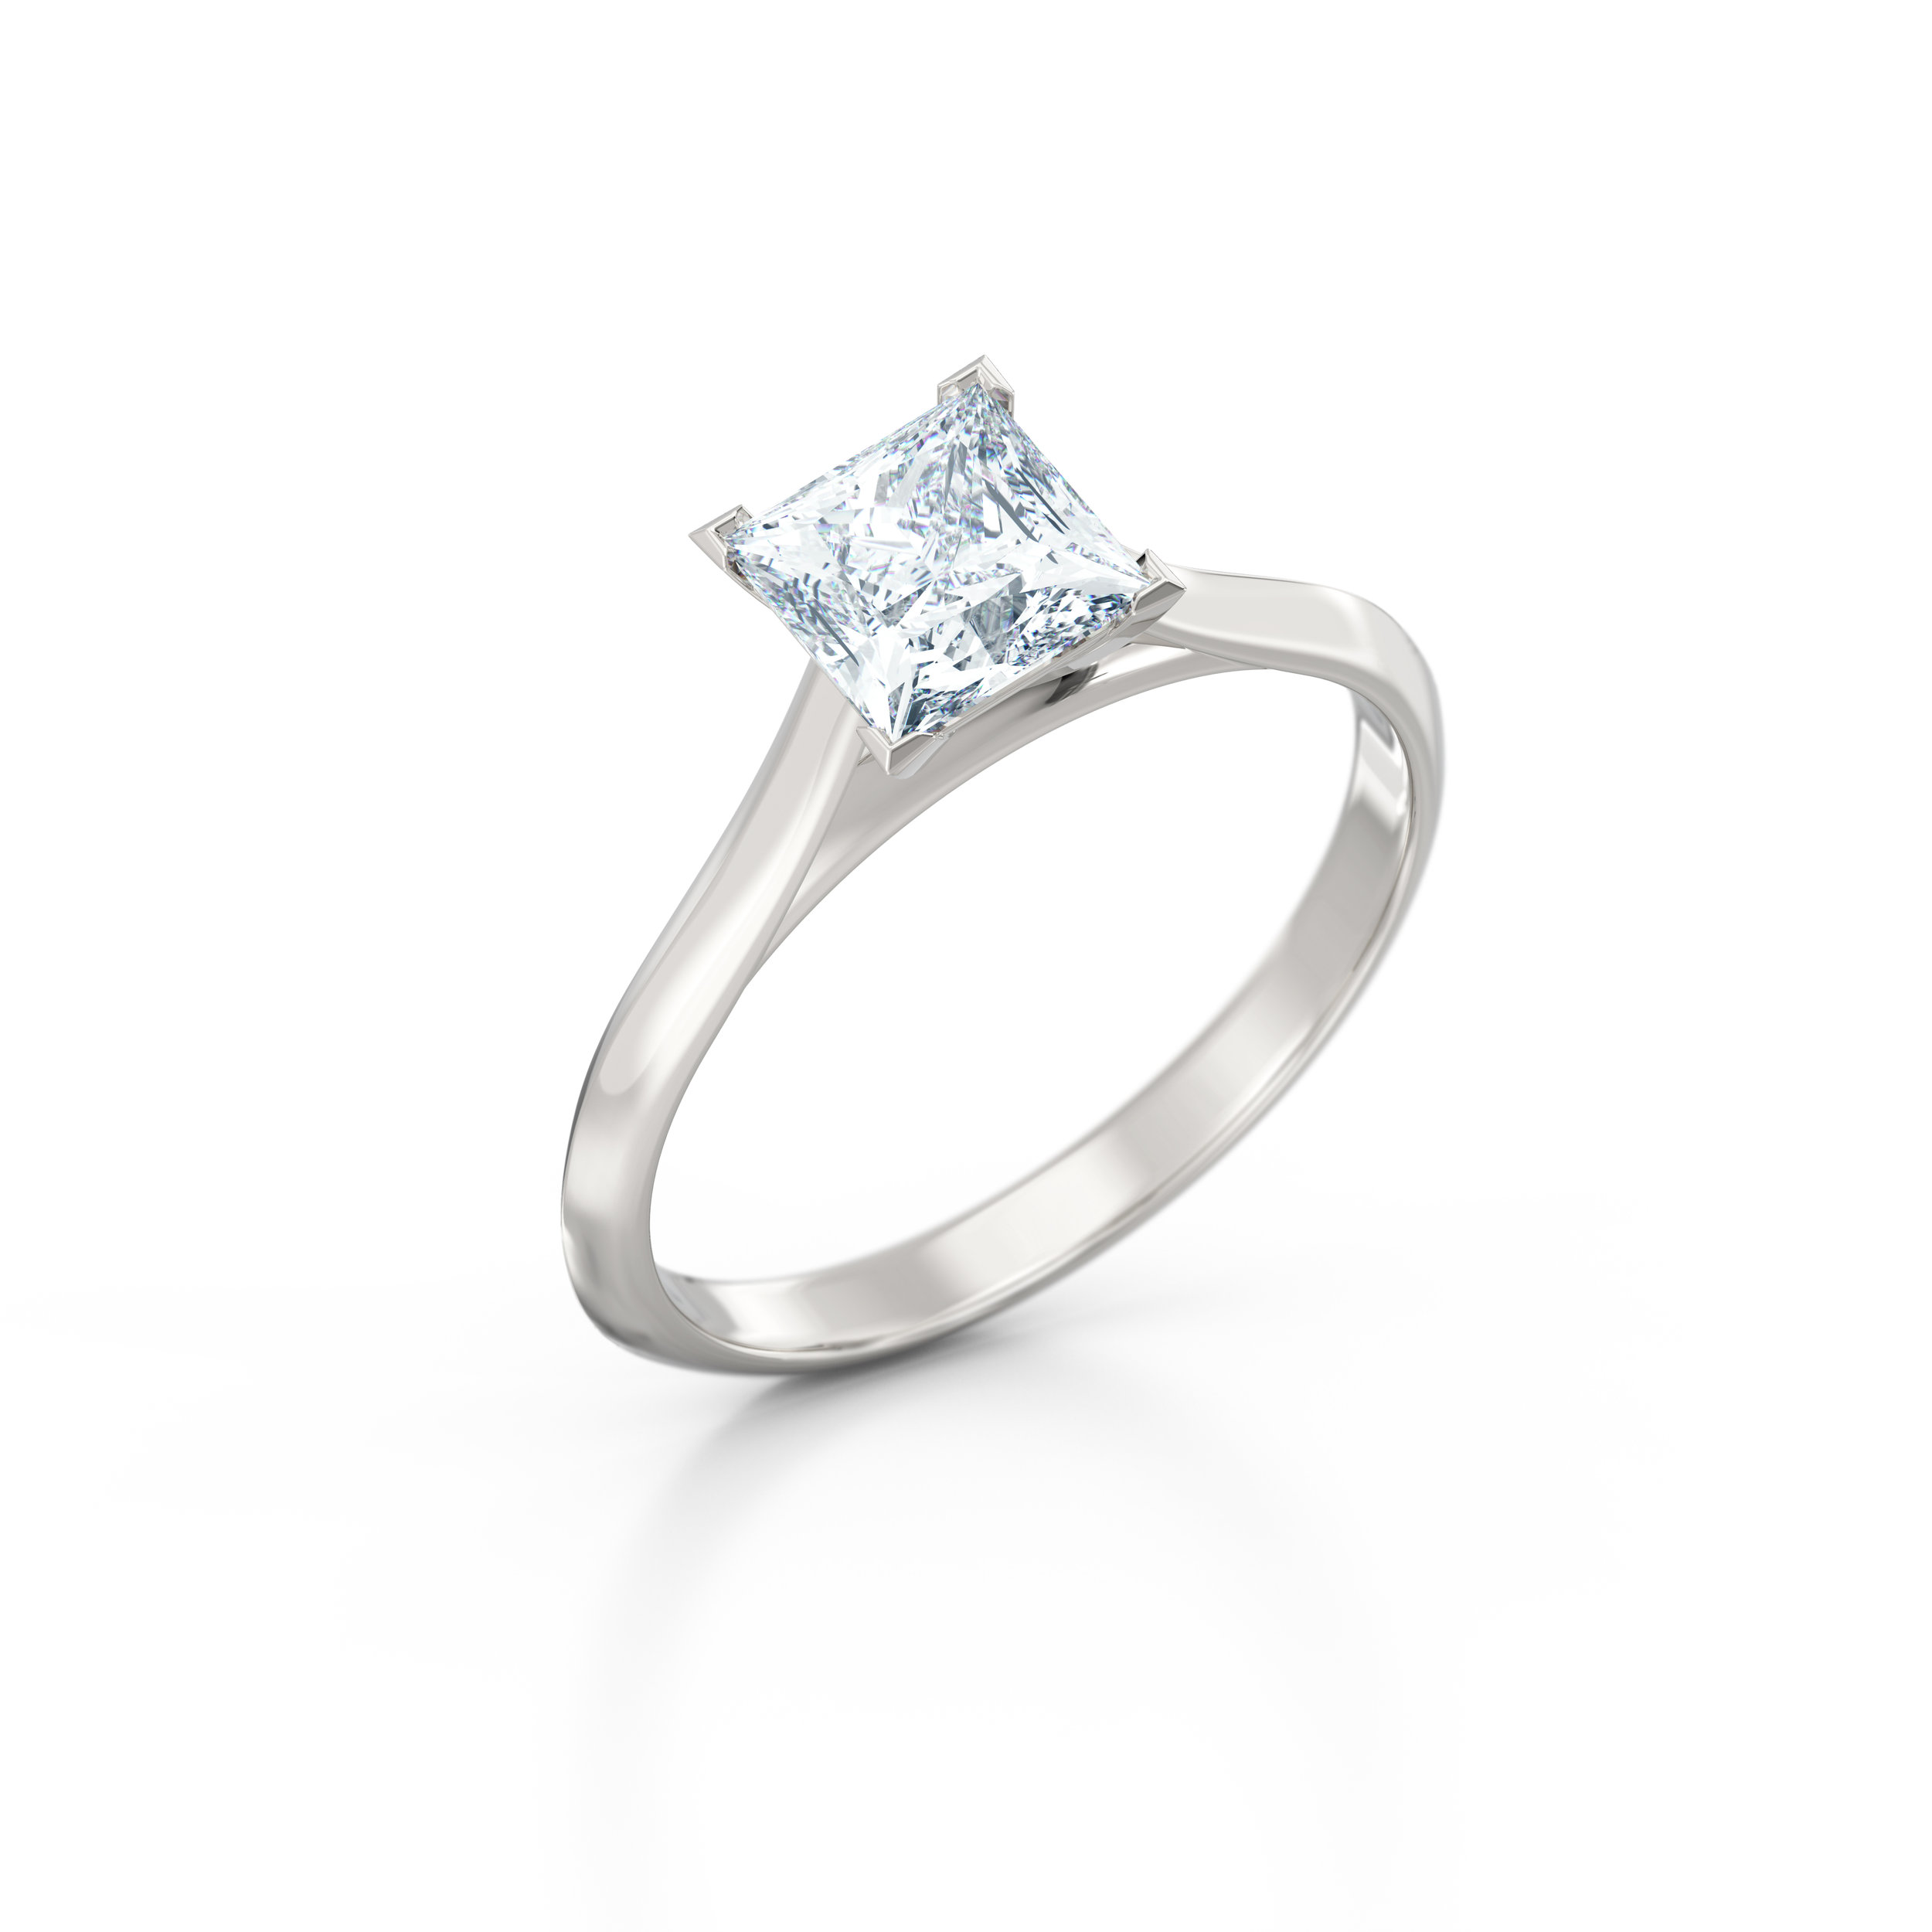 Princess Cut Solitaire Engagement Ring   Hatton Garden